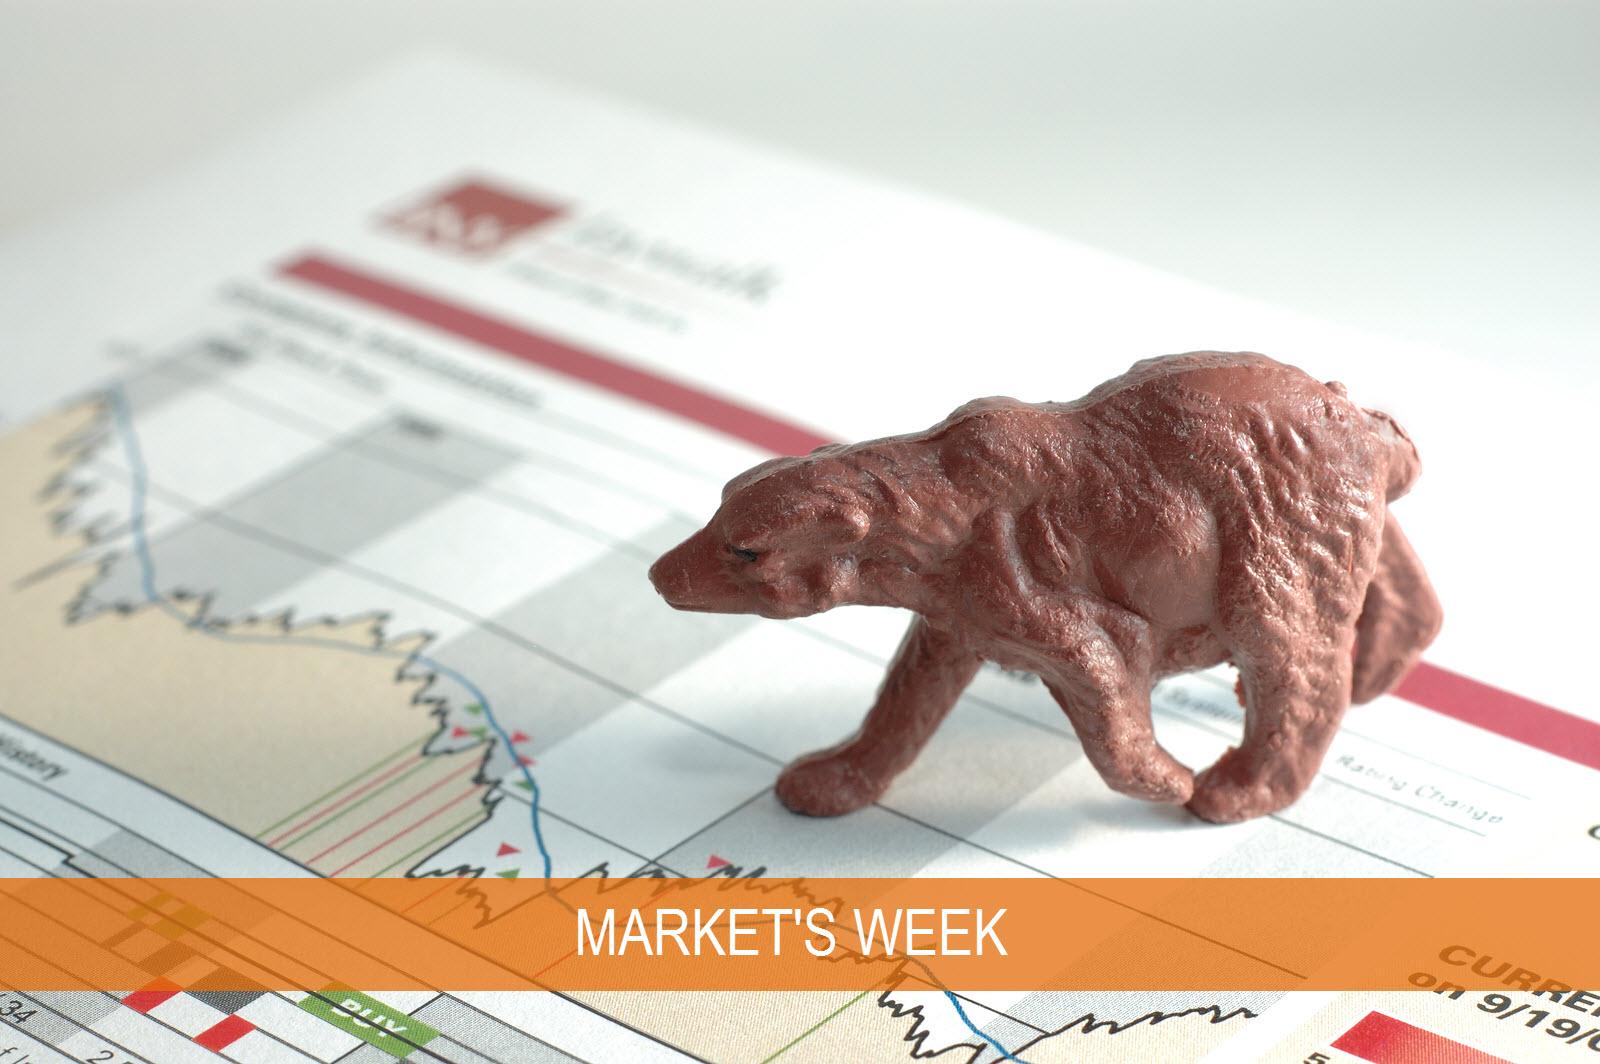 bigstock-Bear-Market-29OctBlog